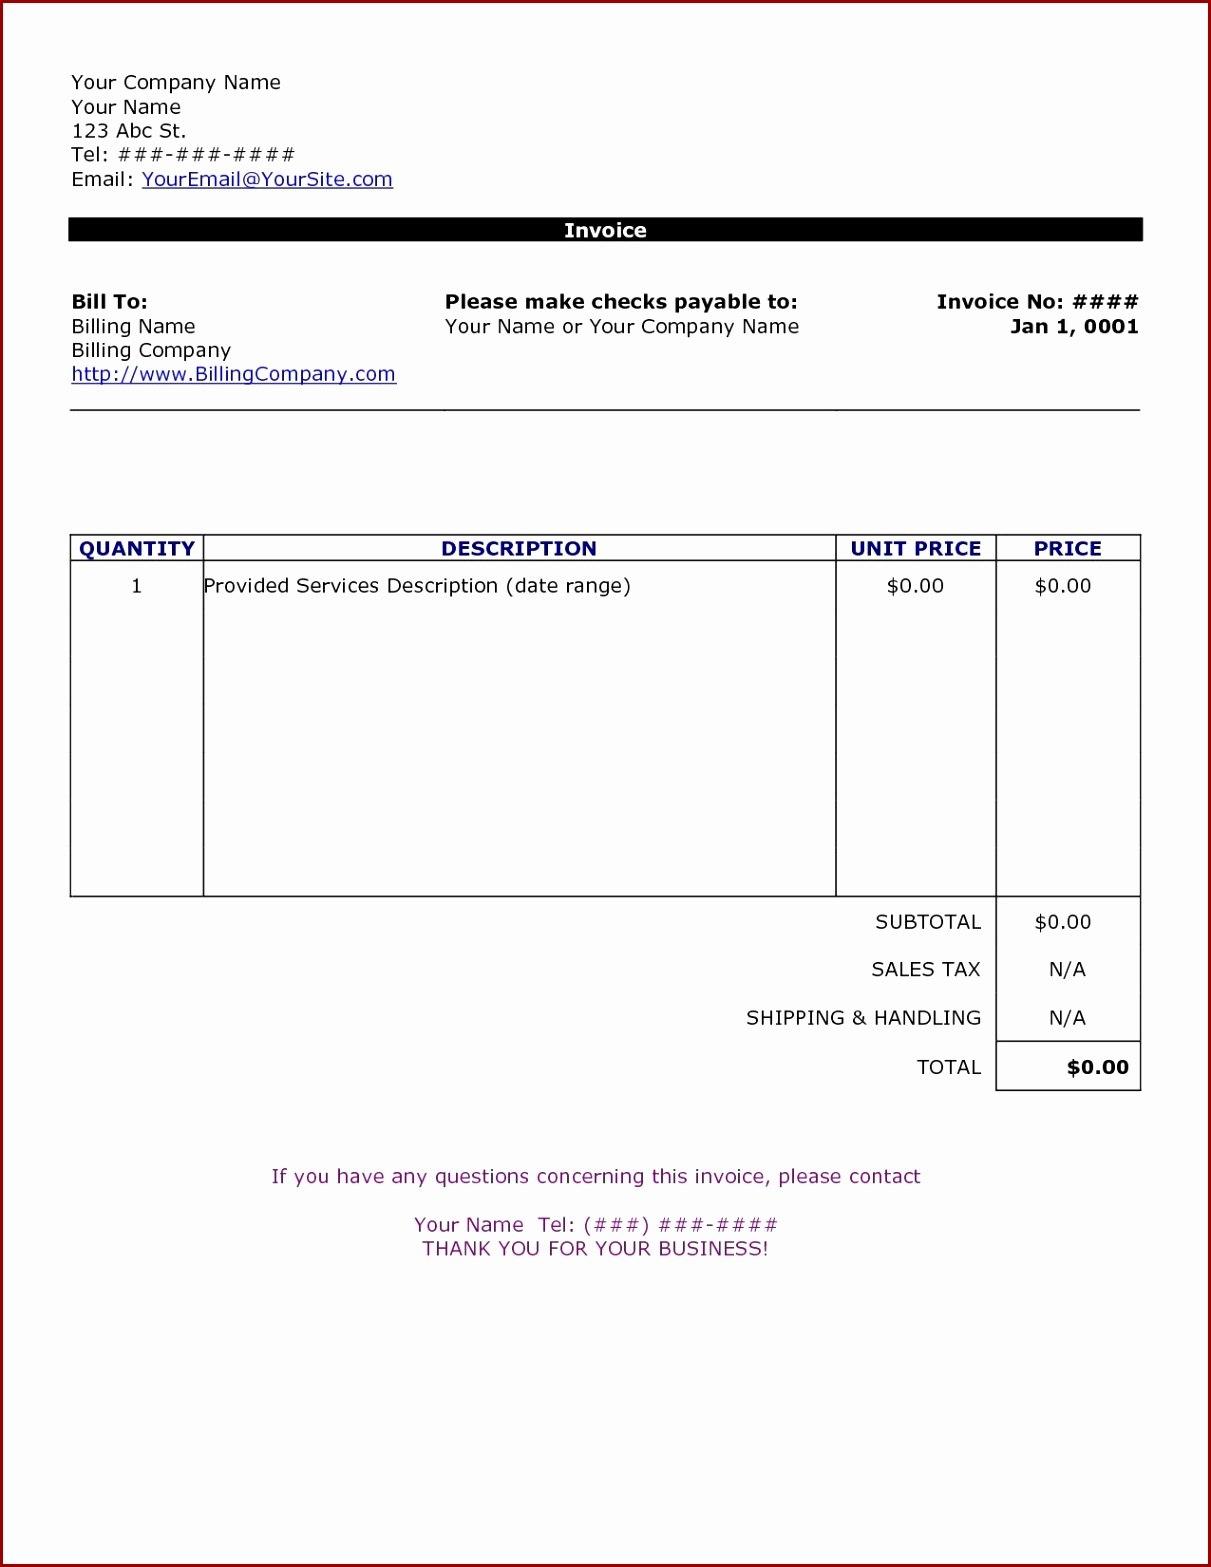 Office Invoice Template Wsfjee Templatezet Libreoffice Download Rent With Libreoffice Invoice Template